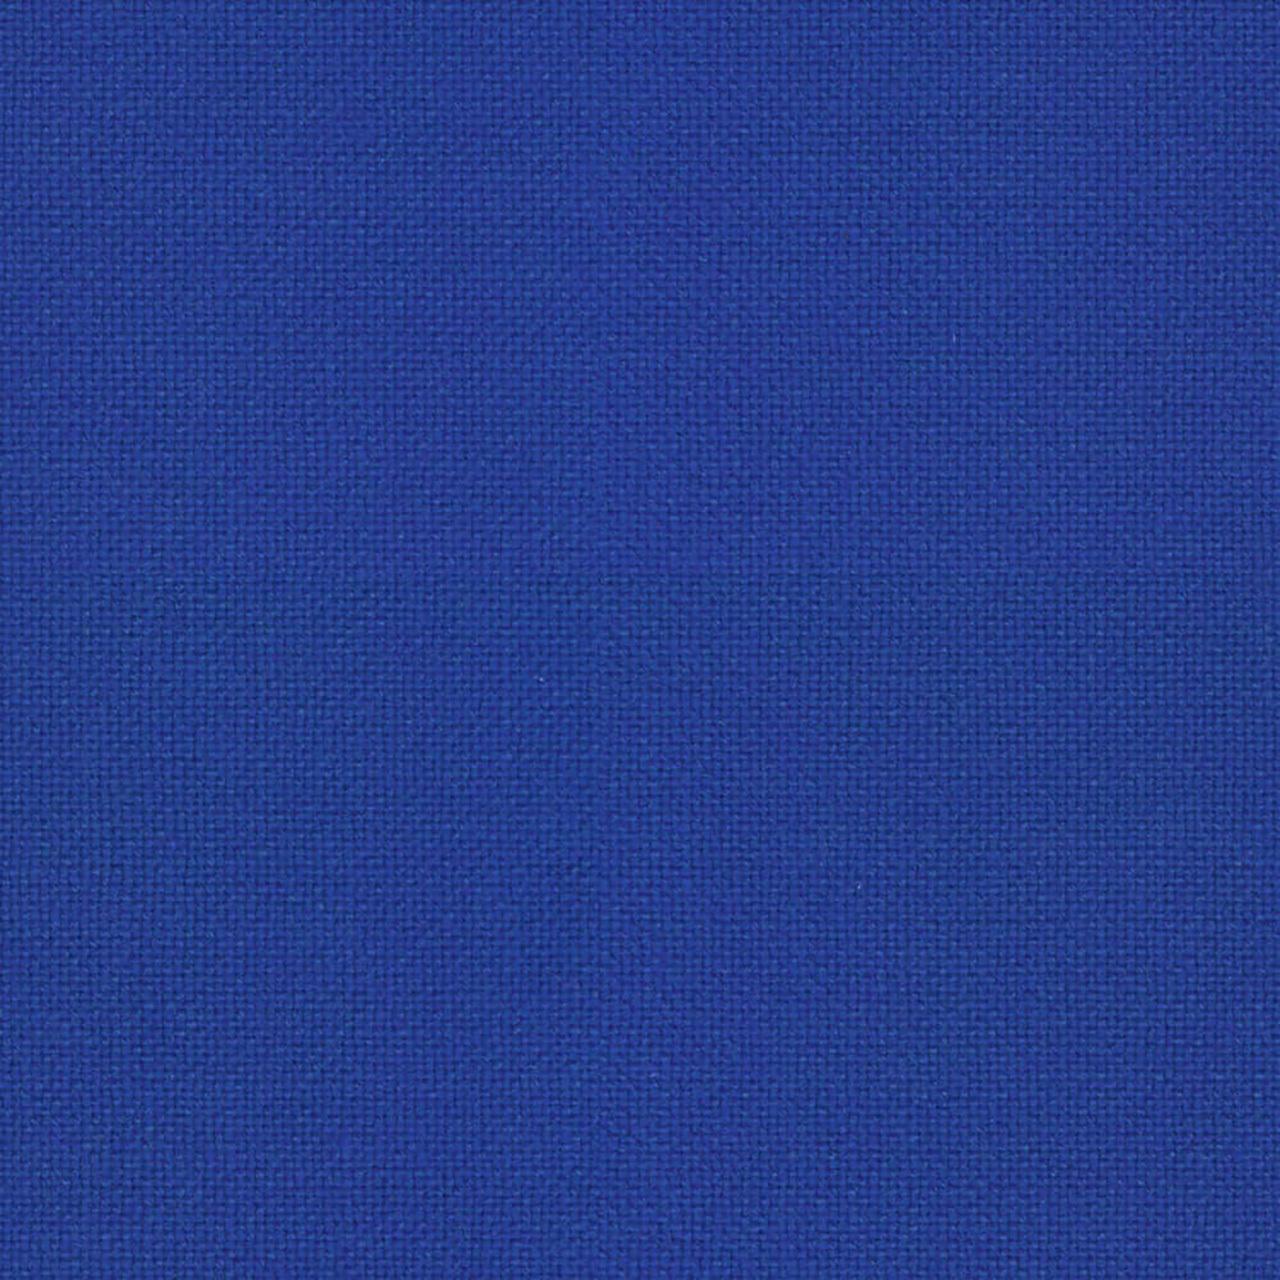 Kvadrat Fabric Hallingdal 0750